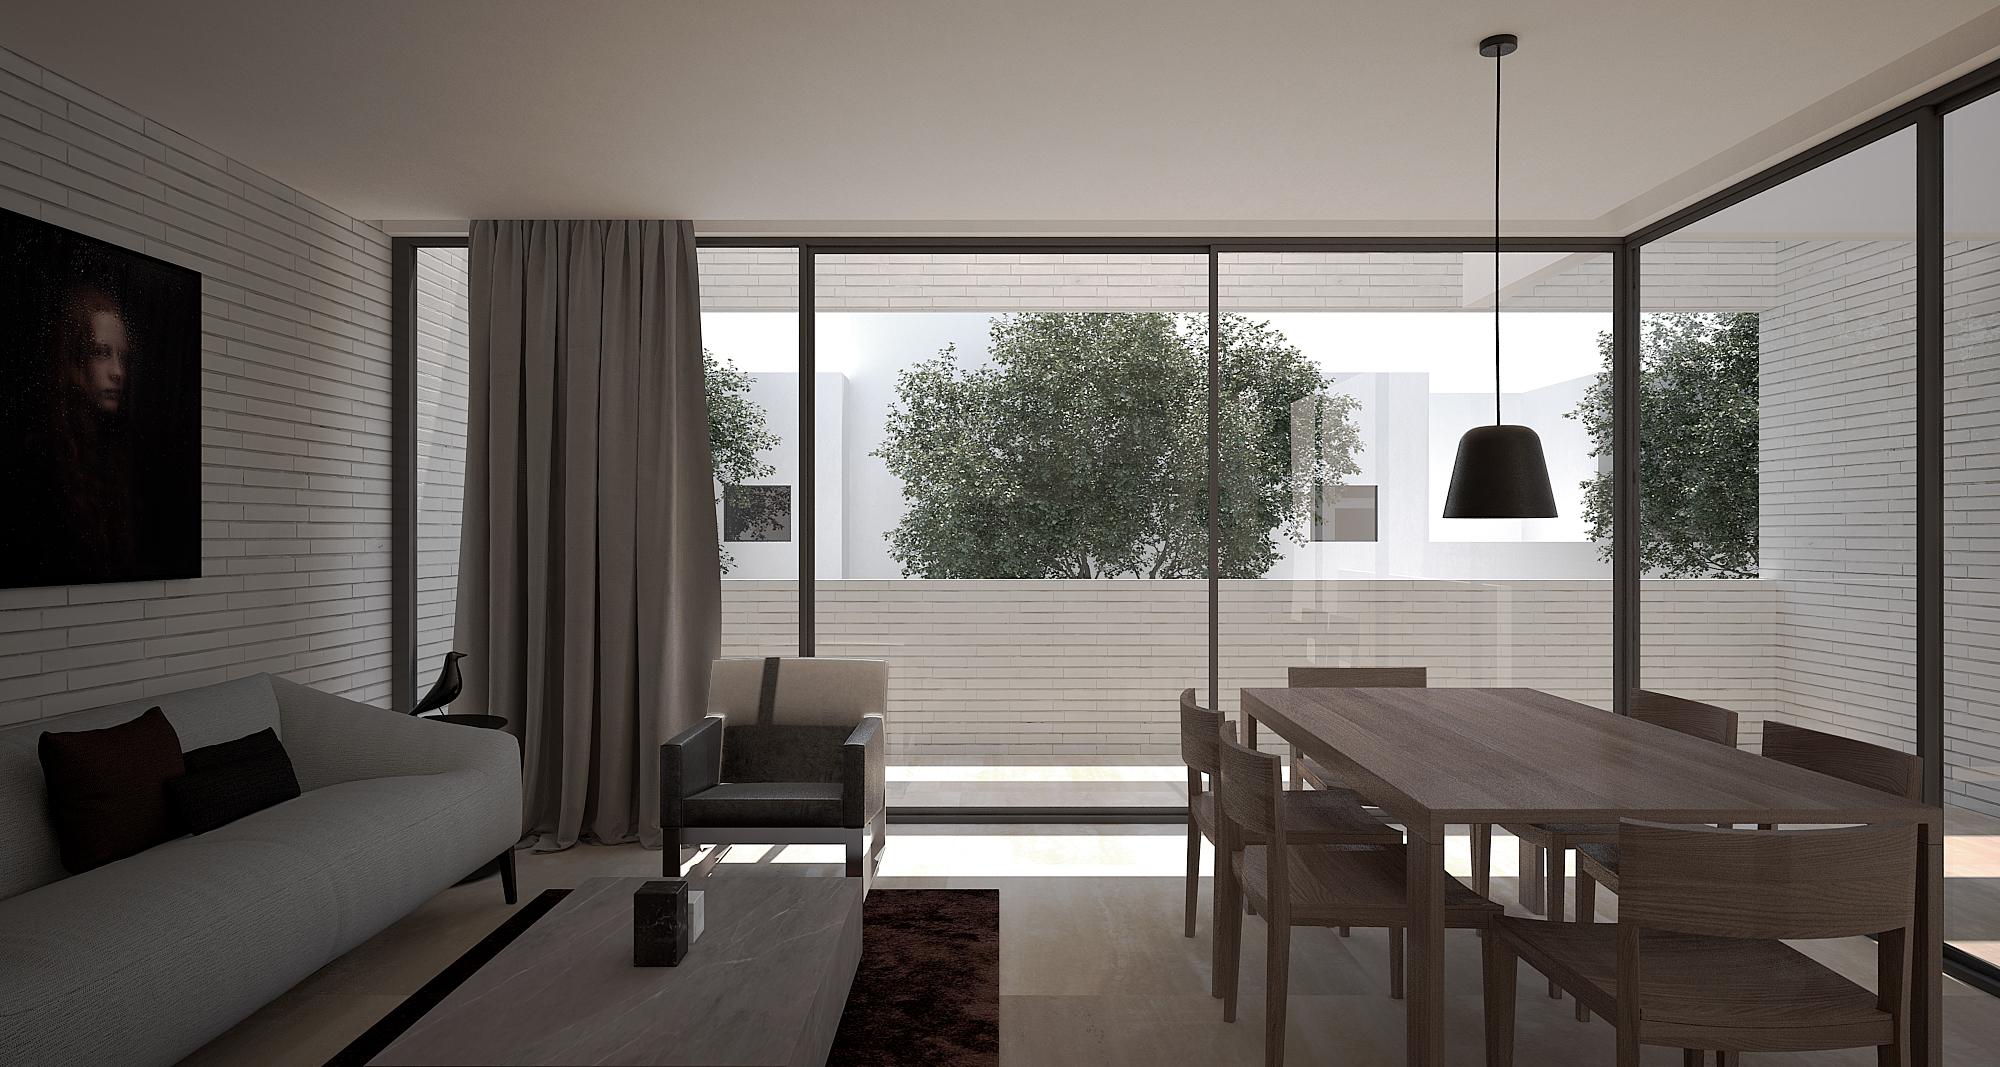 Casas Siamesas - 01